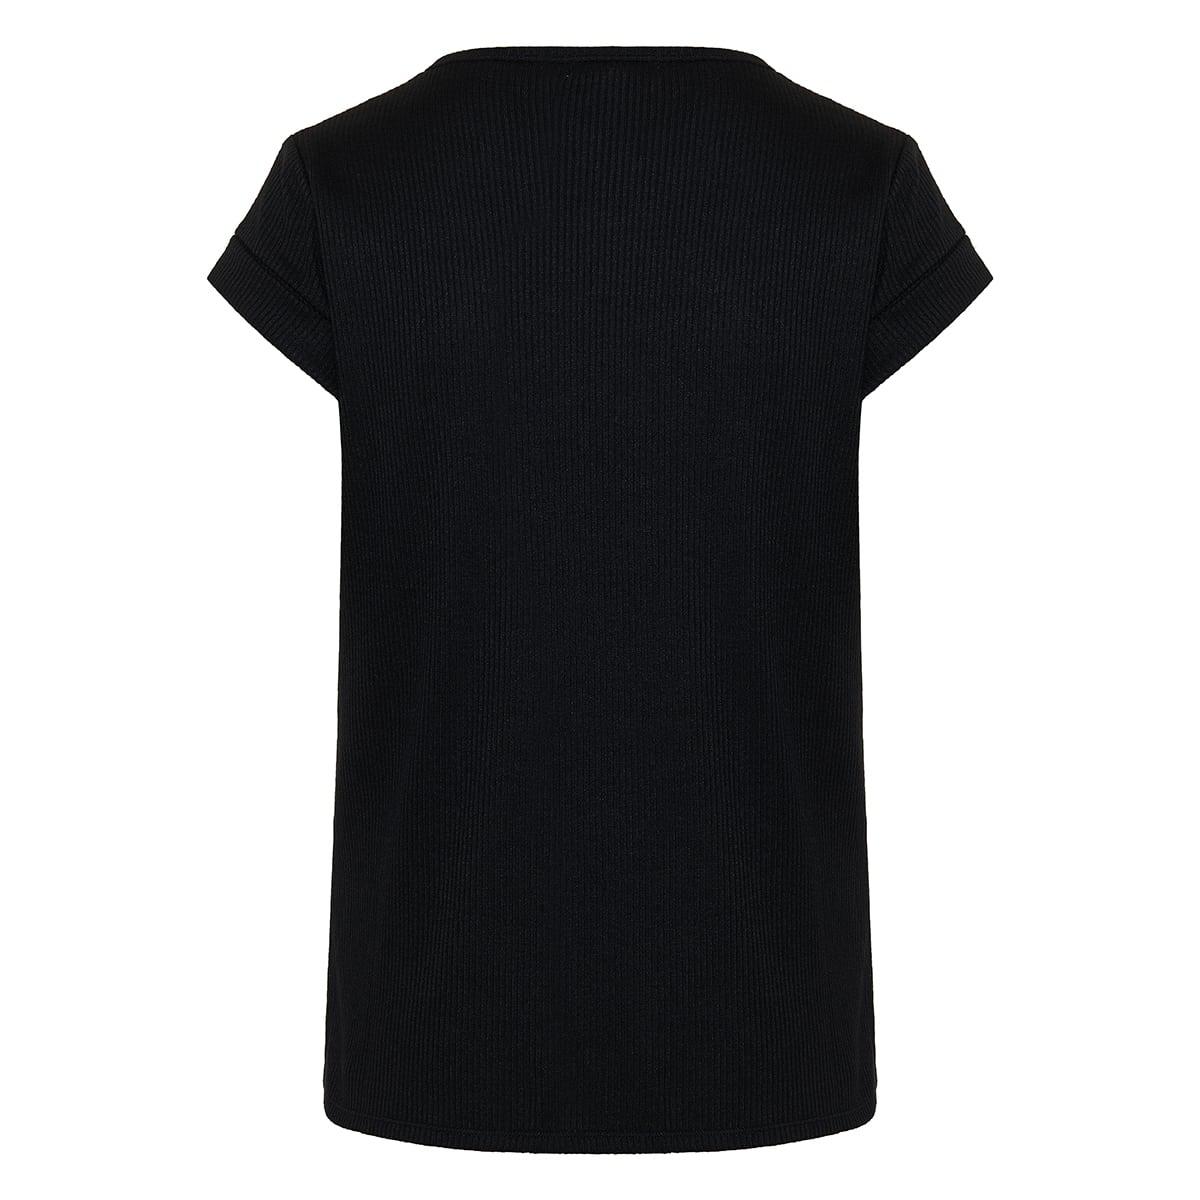 The Knit Rib t-shirt